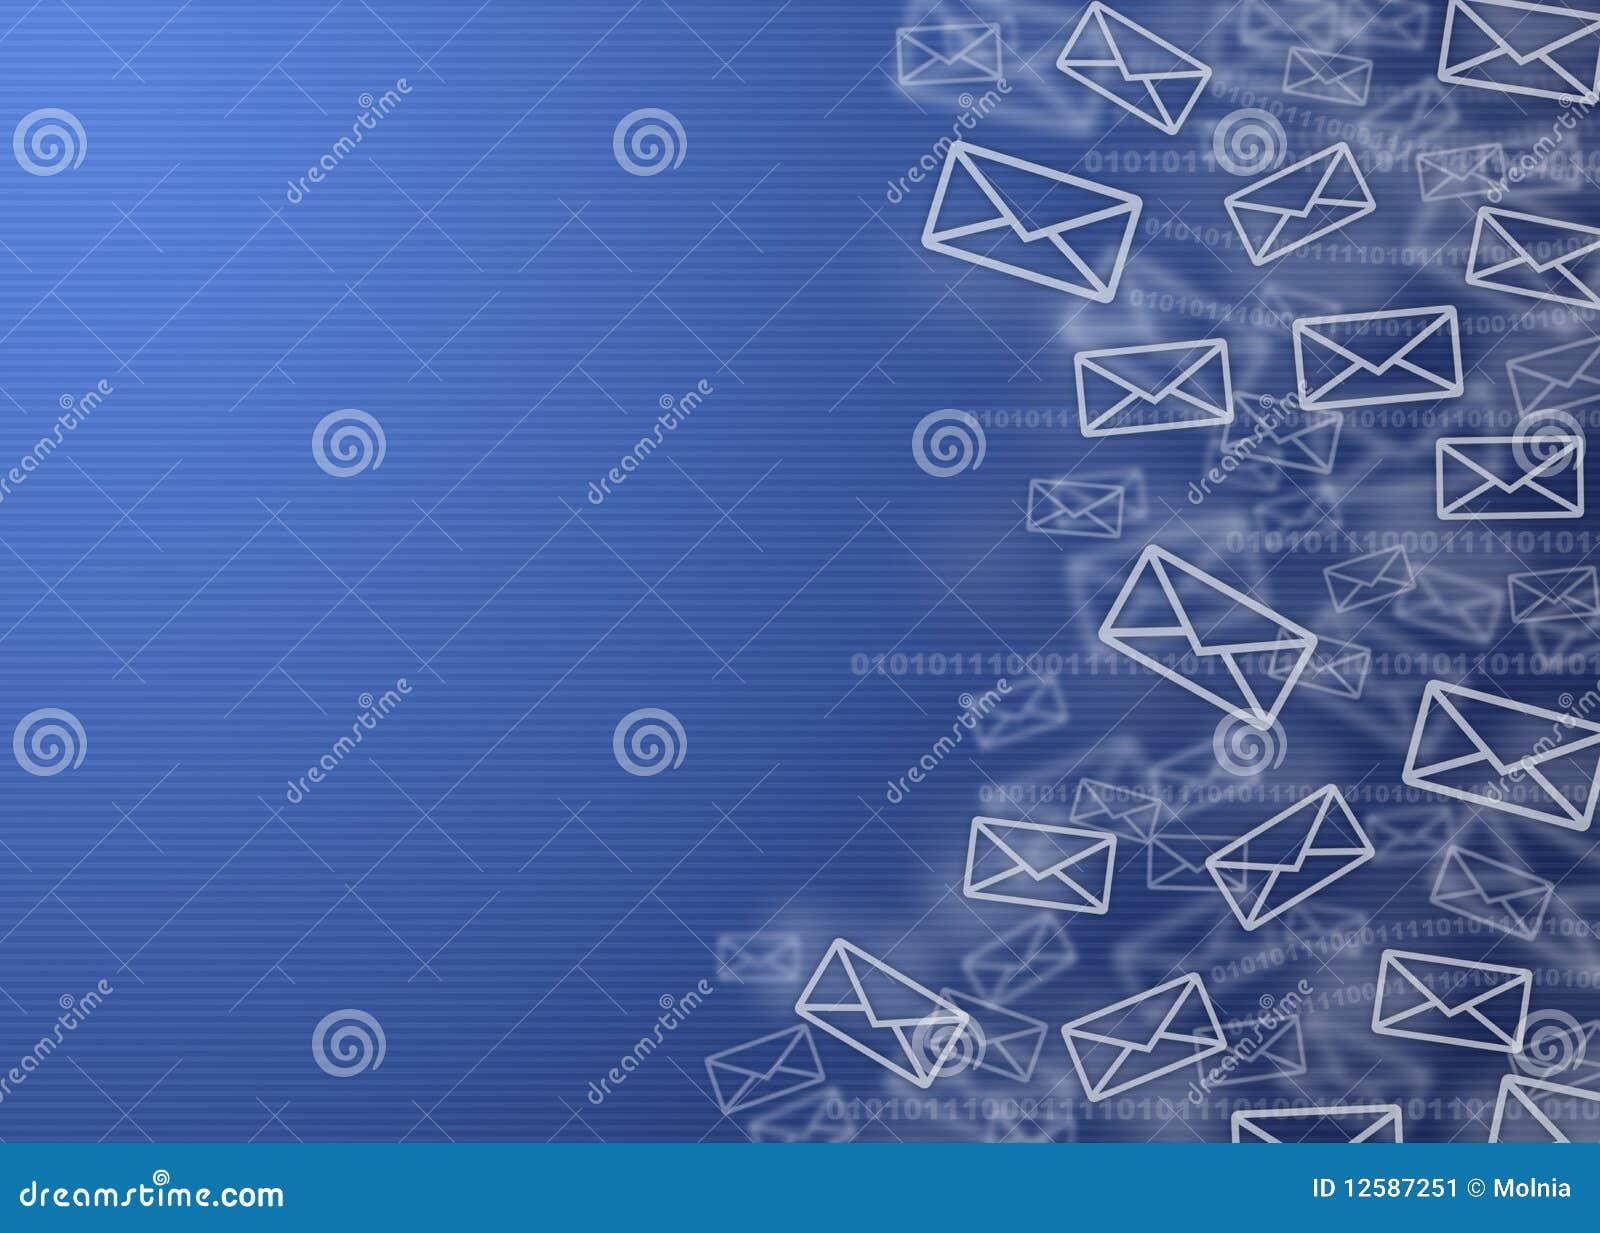 mail background - anuvrat.info